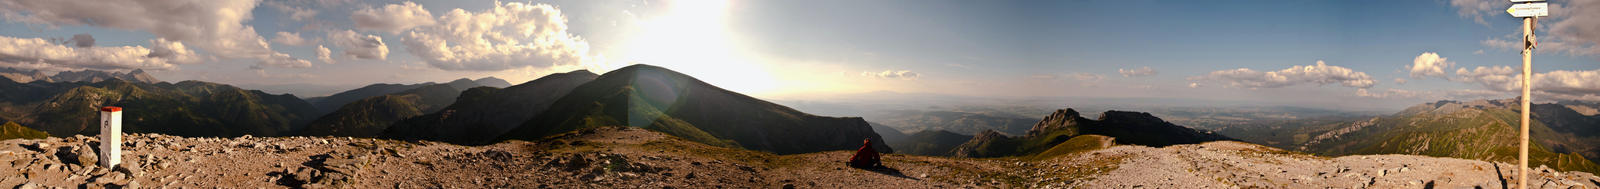 Tatry Panorama by Pawlak91